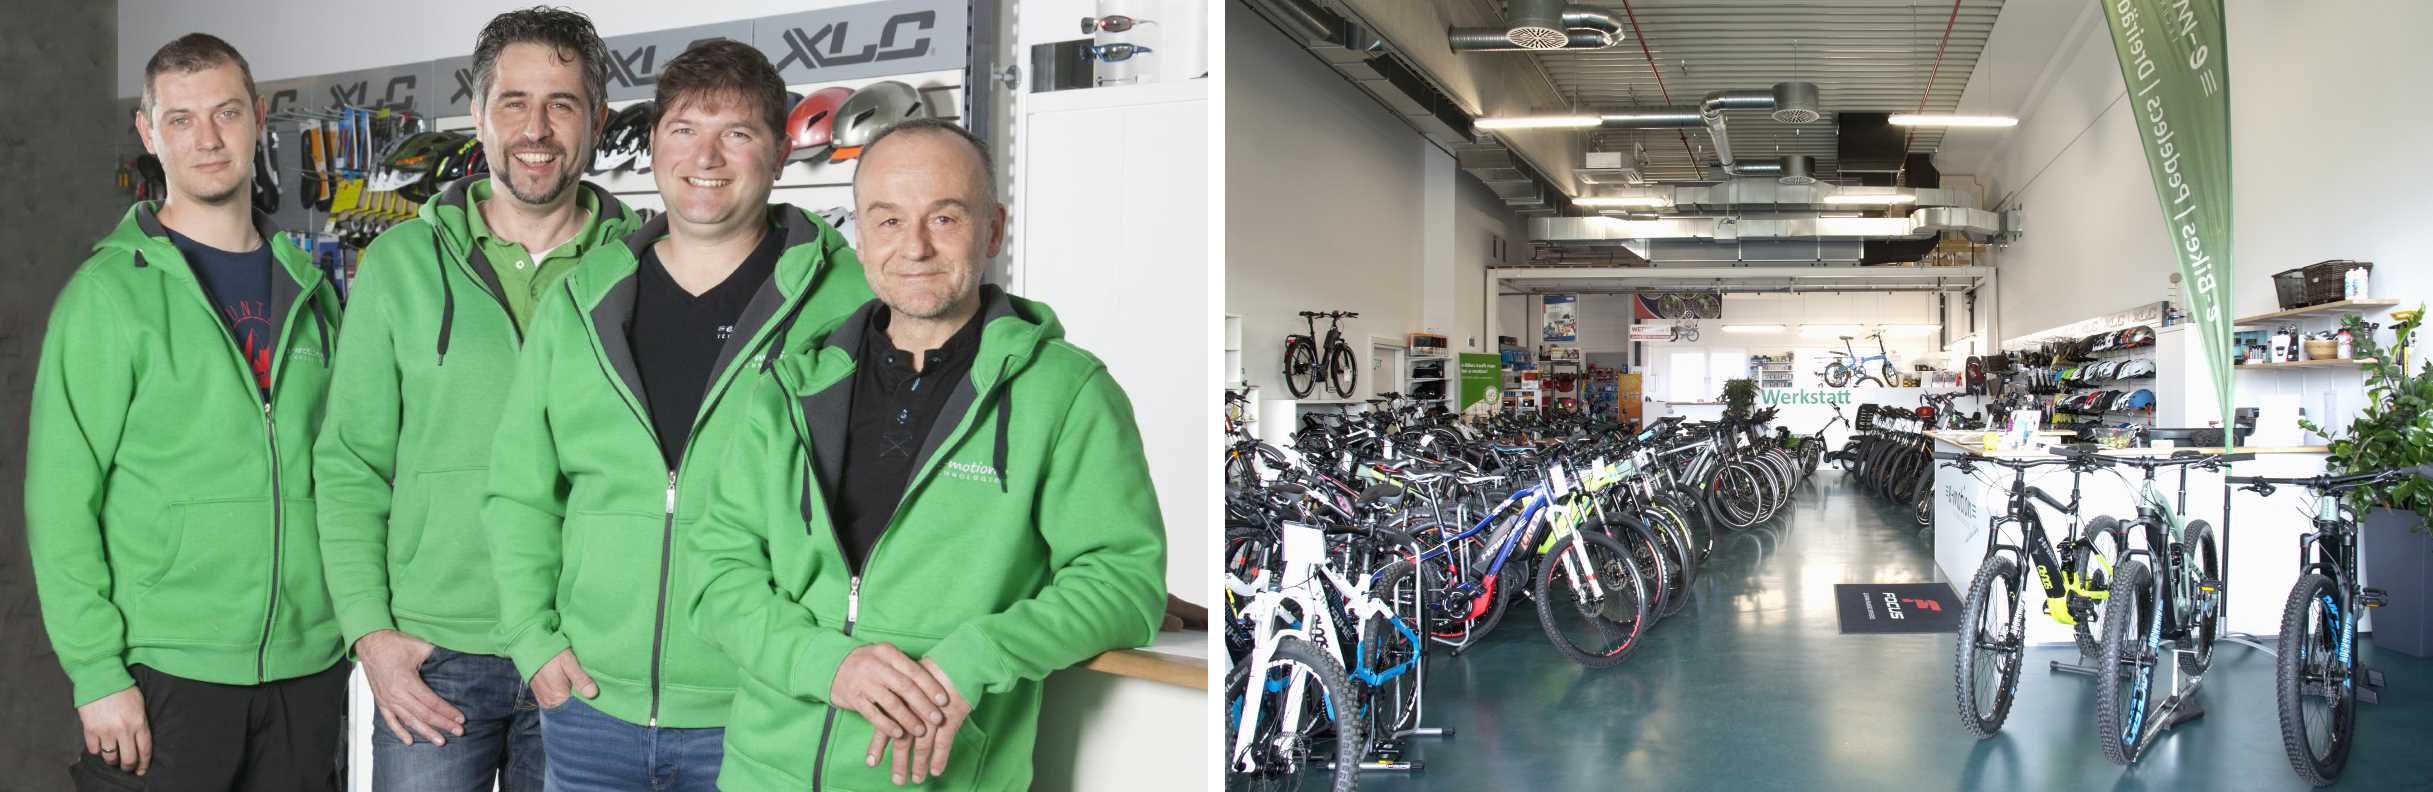 e-motion e-Bike Welt Ulm